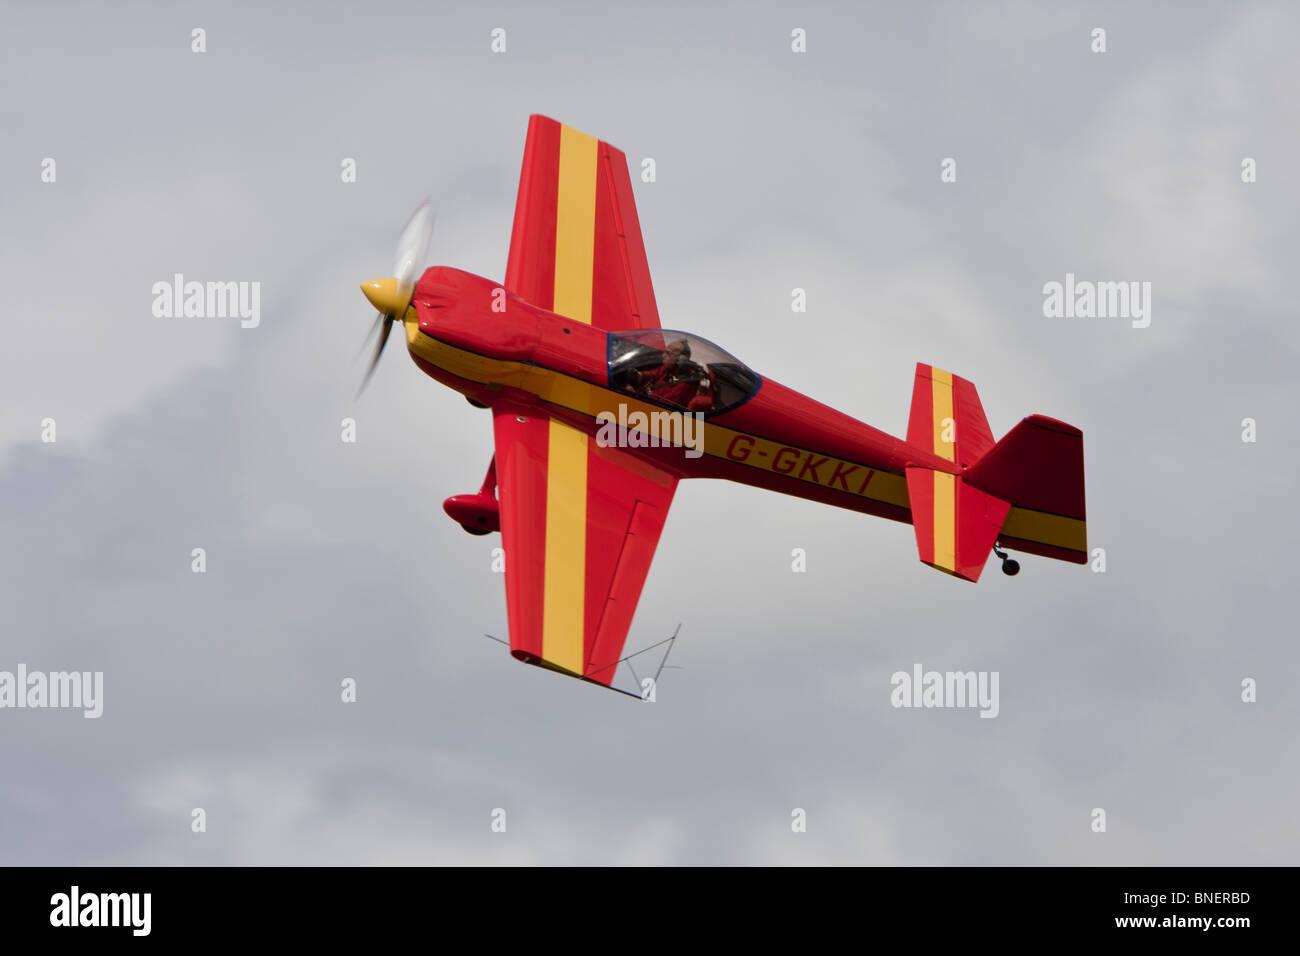 Mudry CAP-231EX, reg. G-GKKI, at Breighton - Stock Image